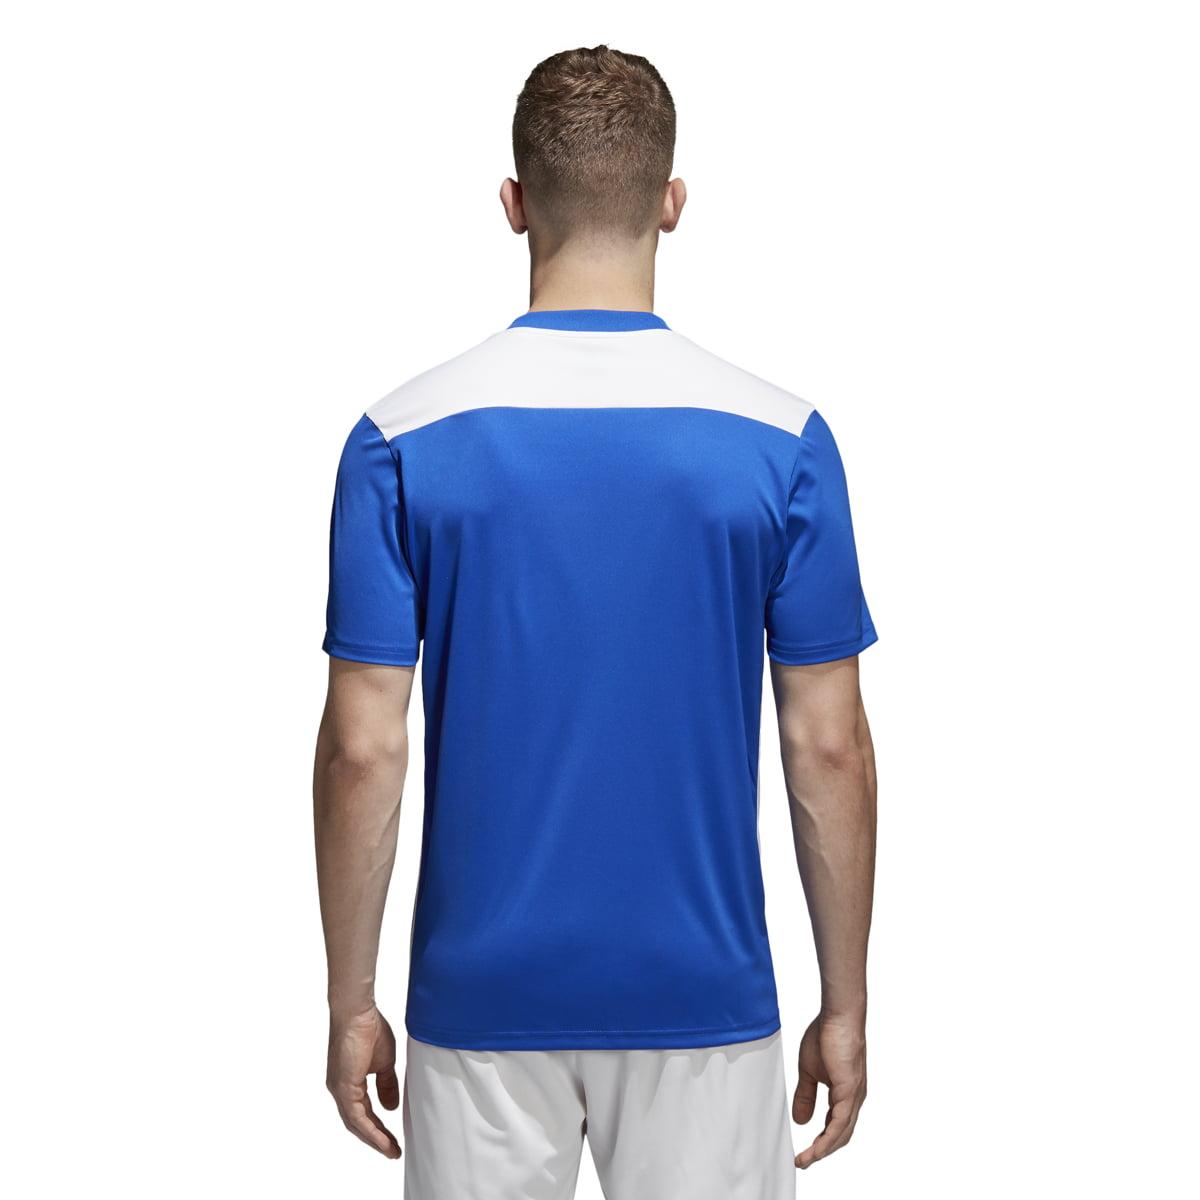 Adidas Regista 18 Jersey Men's Soccer Adidas - Ships Directly From Adidas